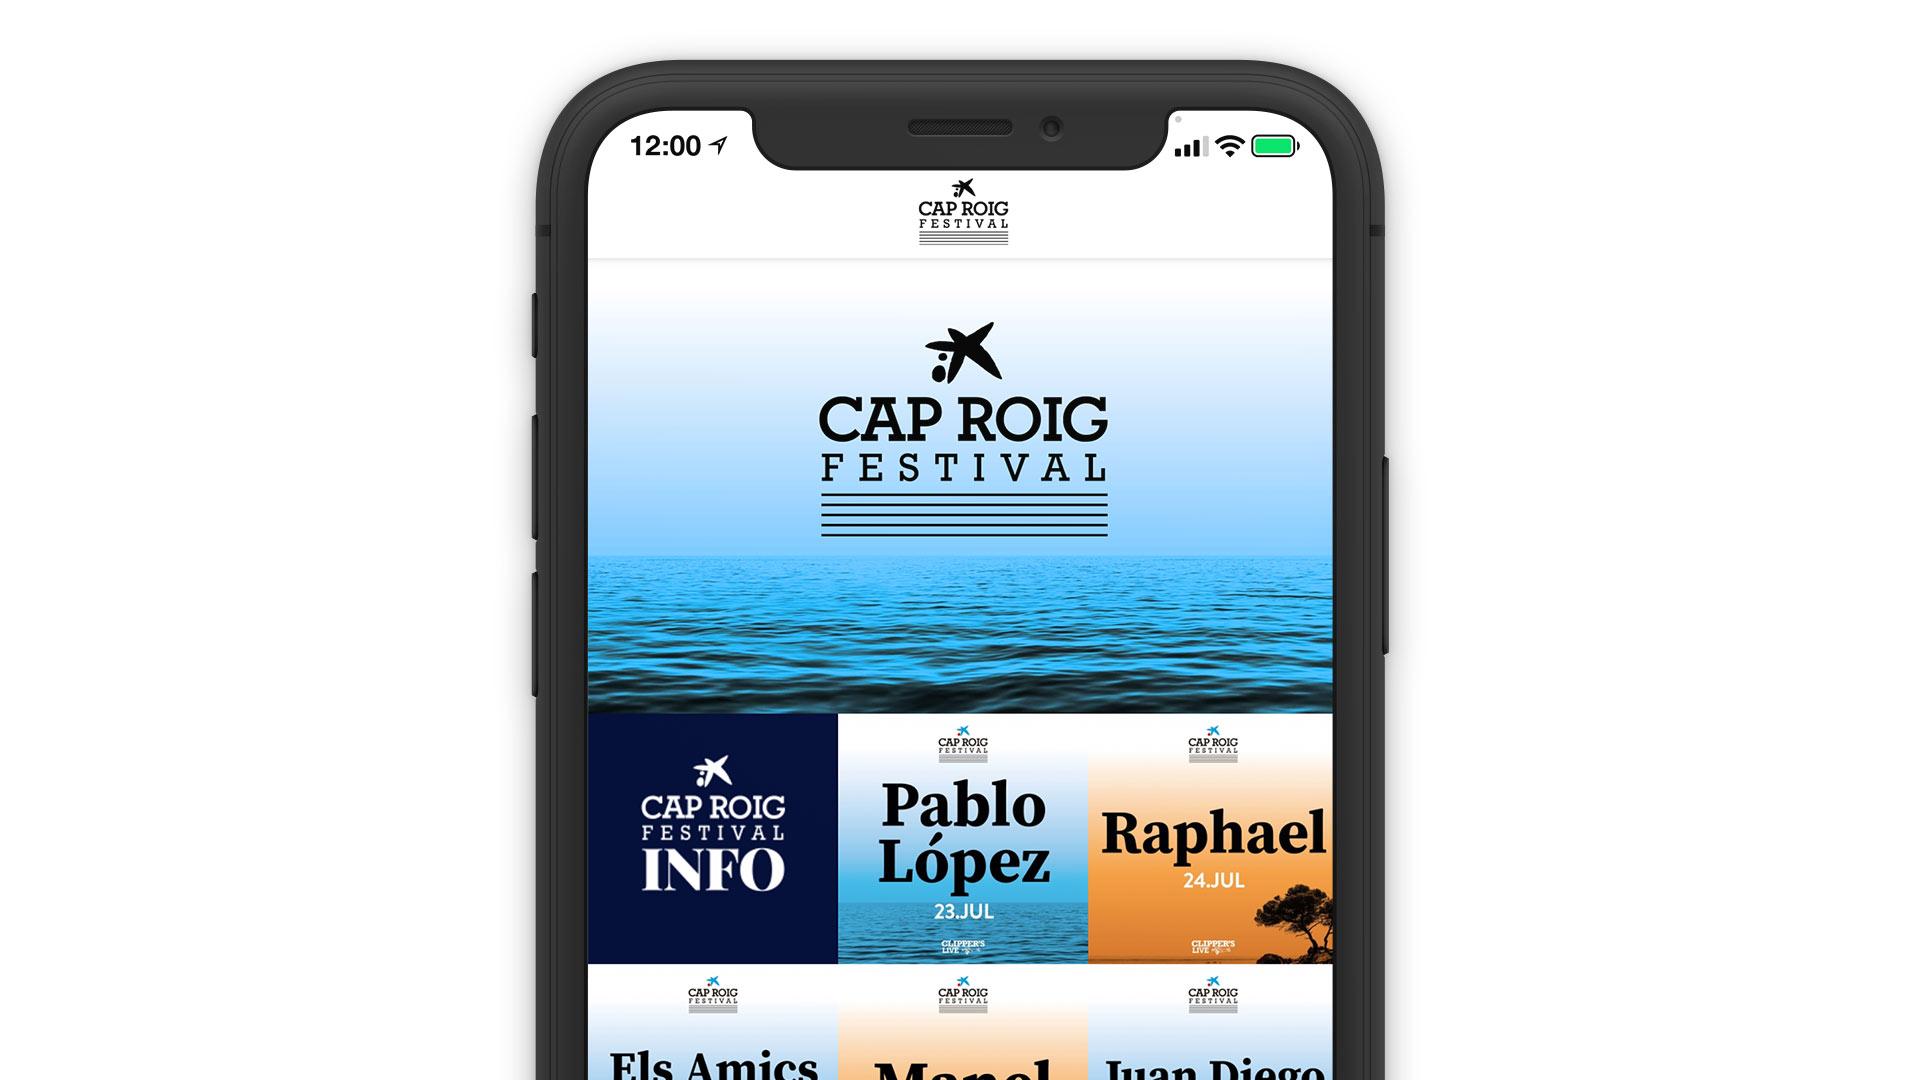 Cap Roig Festival Direct Booking System Reservation Solution Mobile App Online Laptop